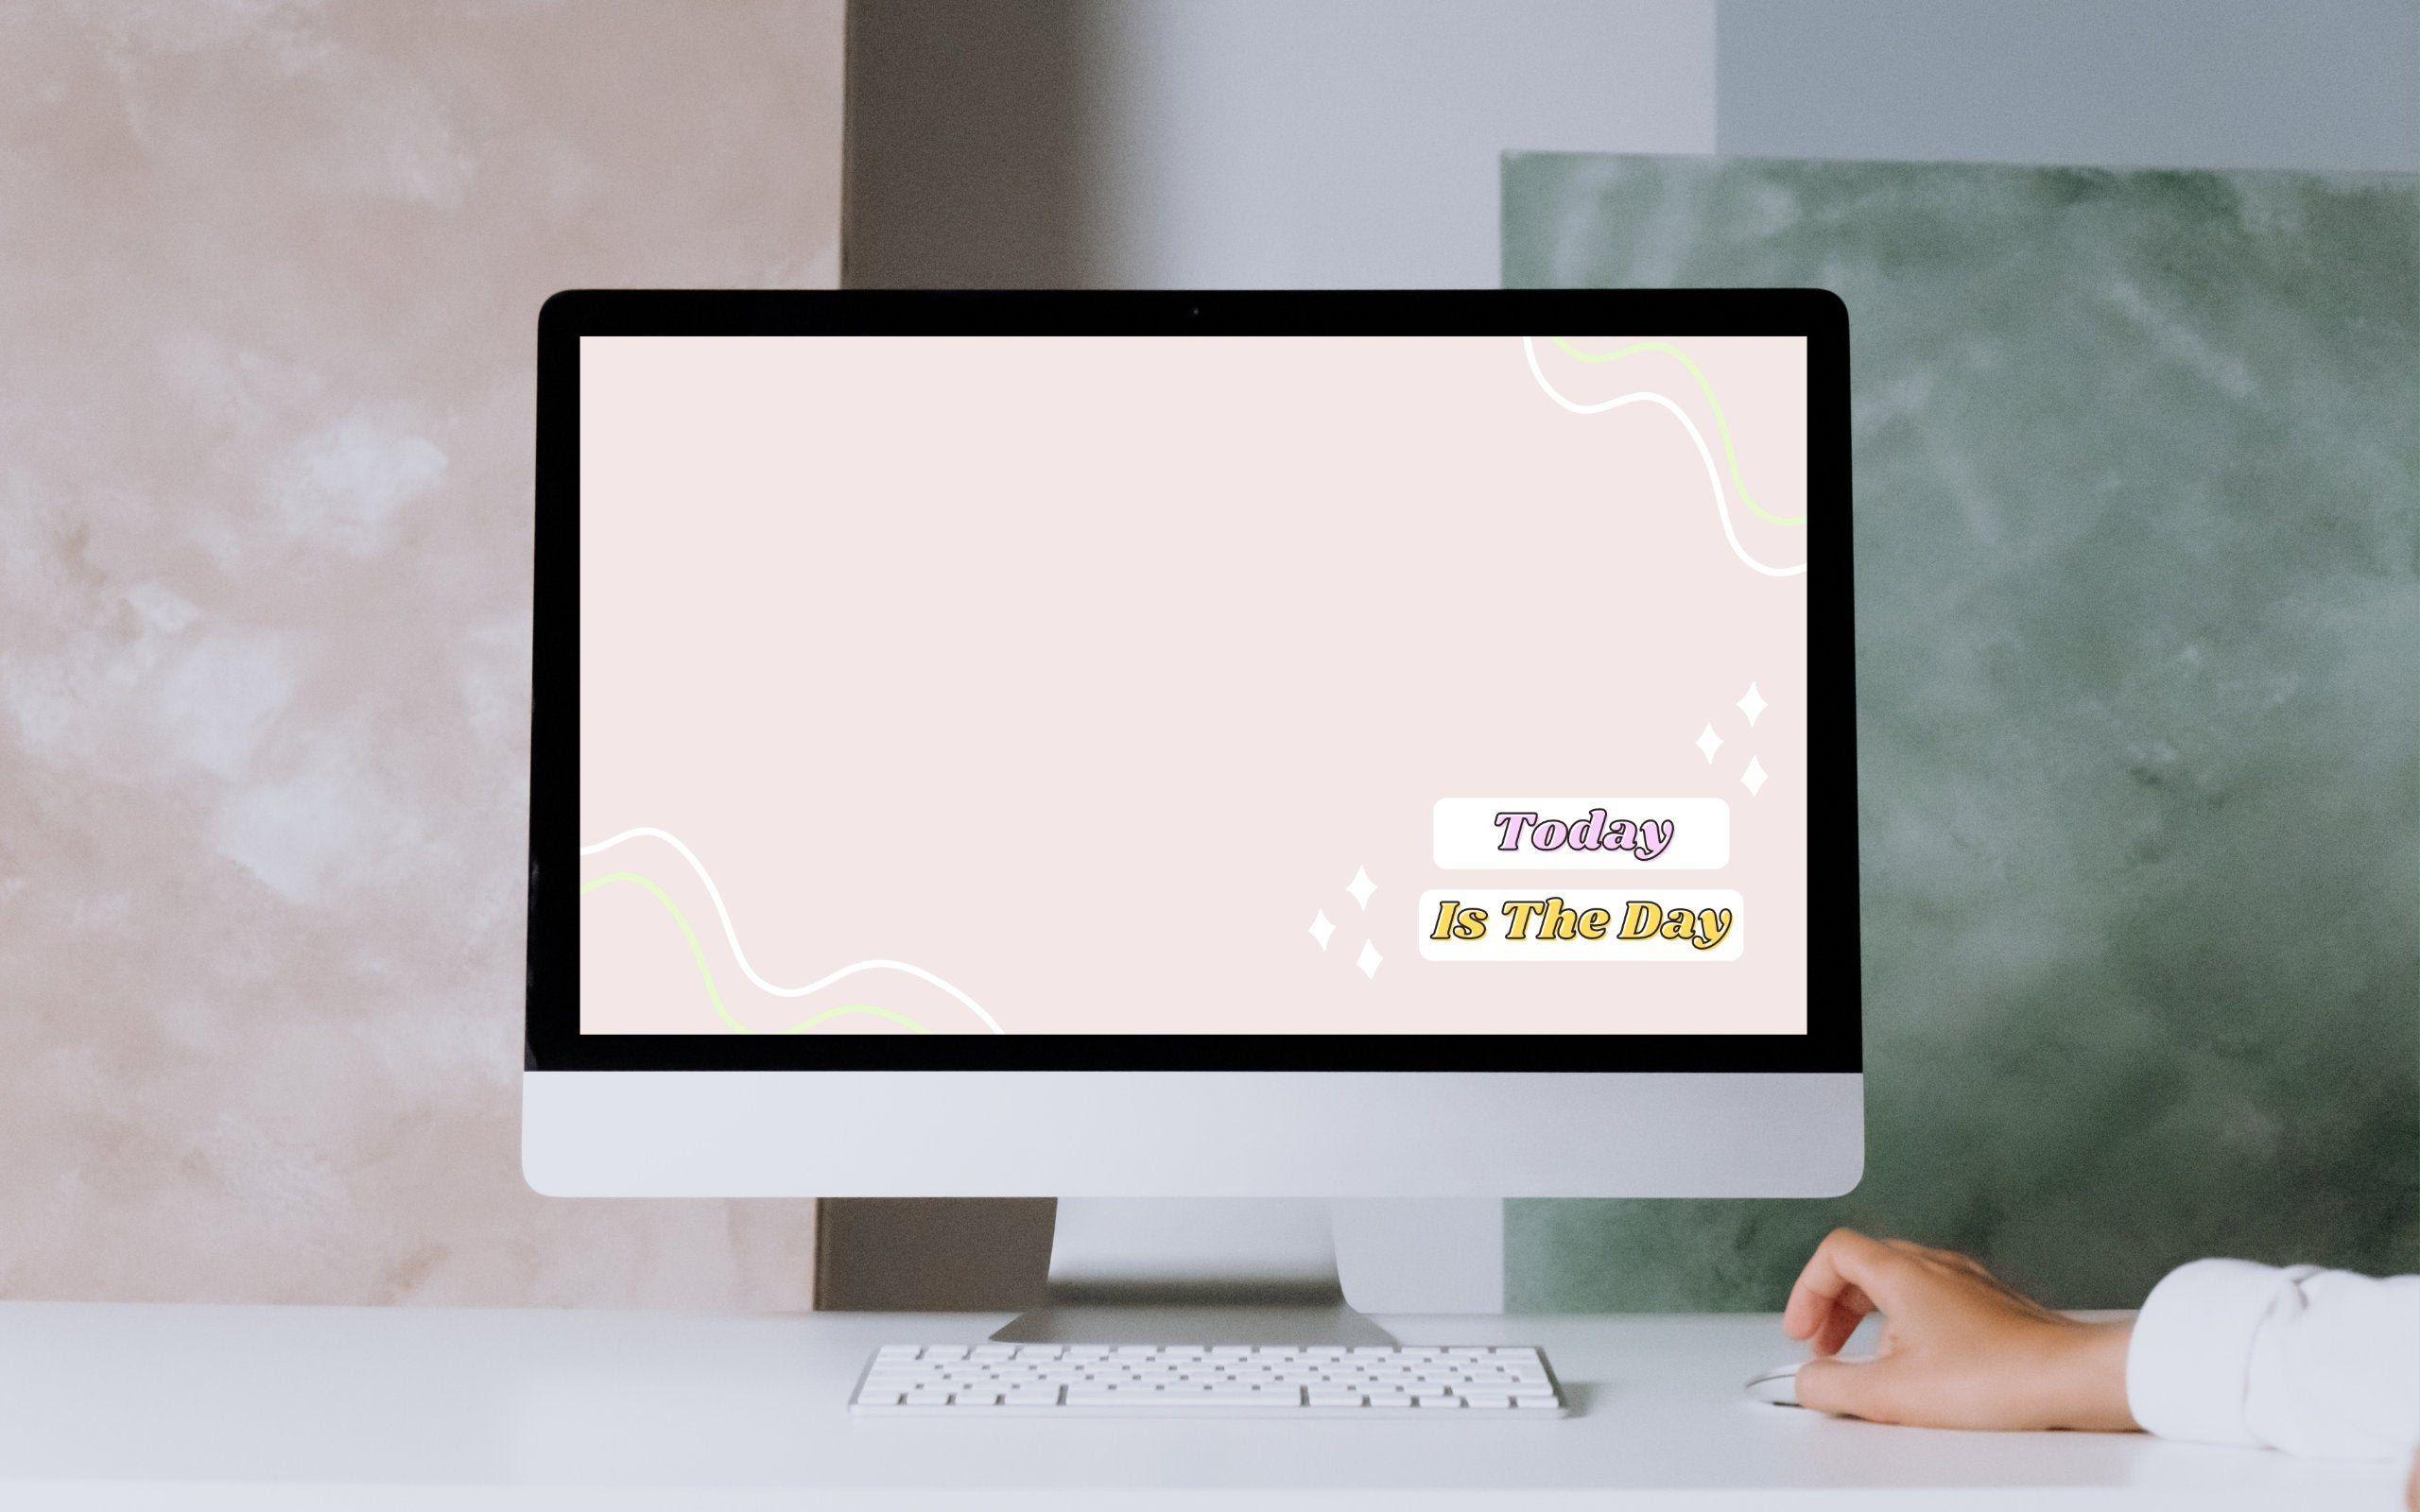 Motivational Cute Colorful Wallpaper Laptop Background Etsy In 2021 Colorful Wallpaper Wallpaper Laptop Backgrounds